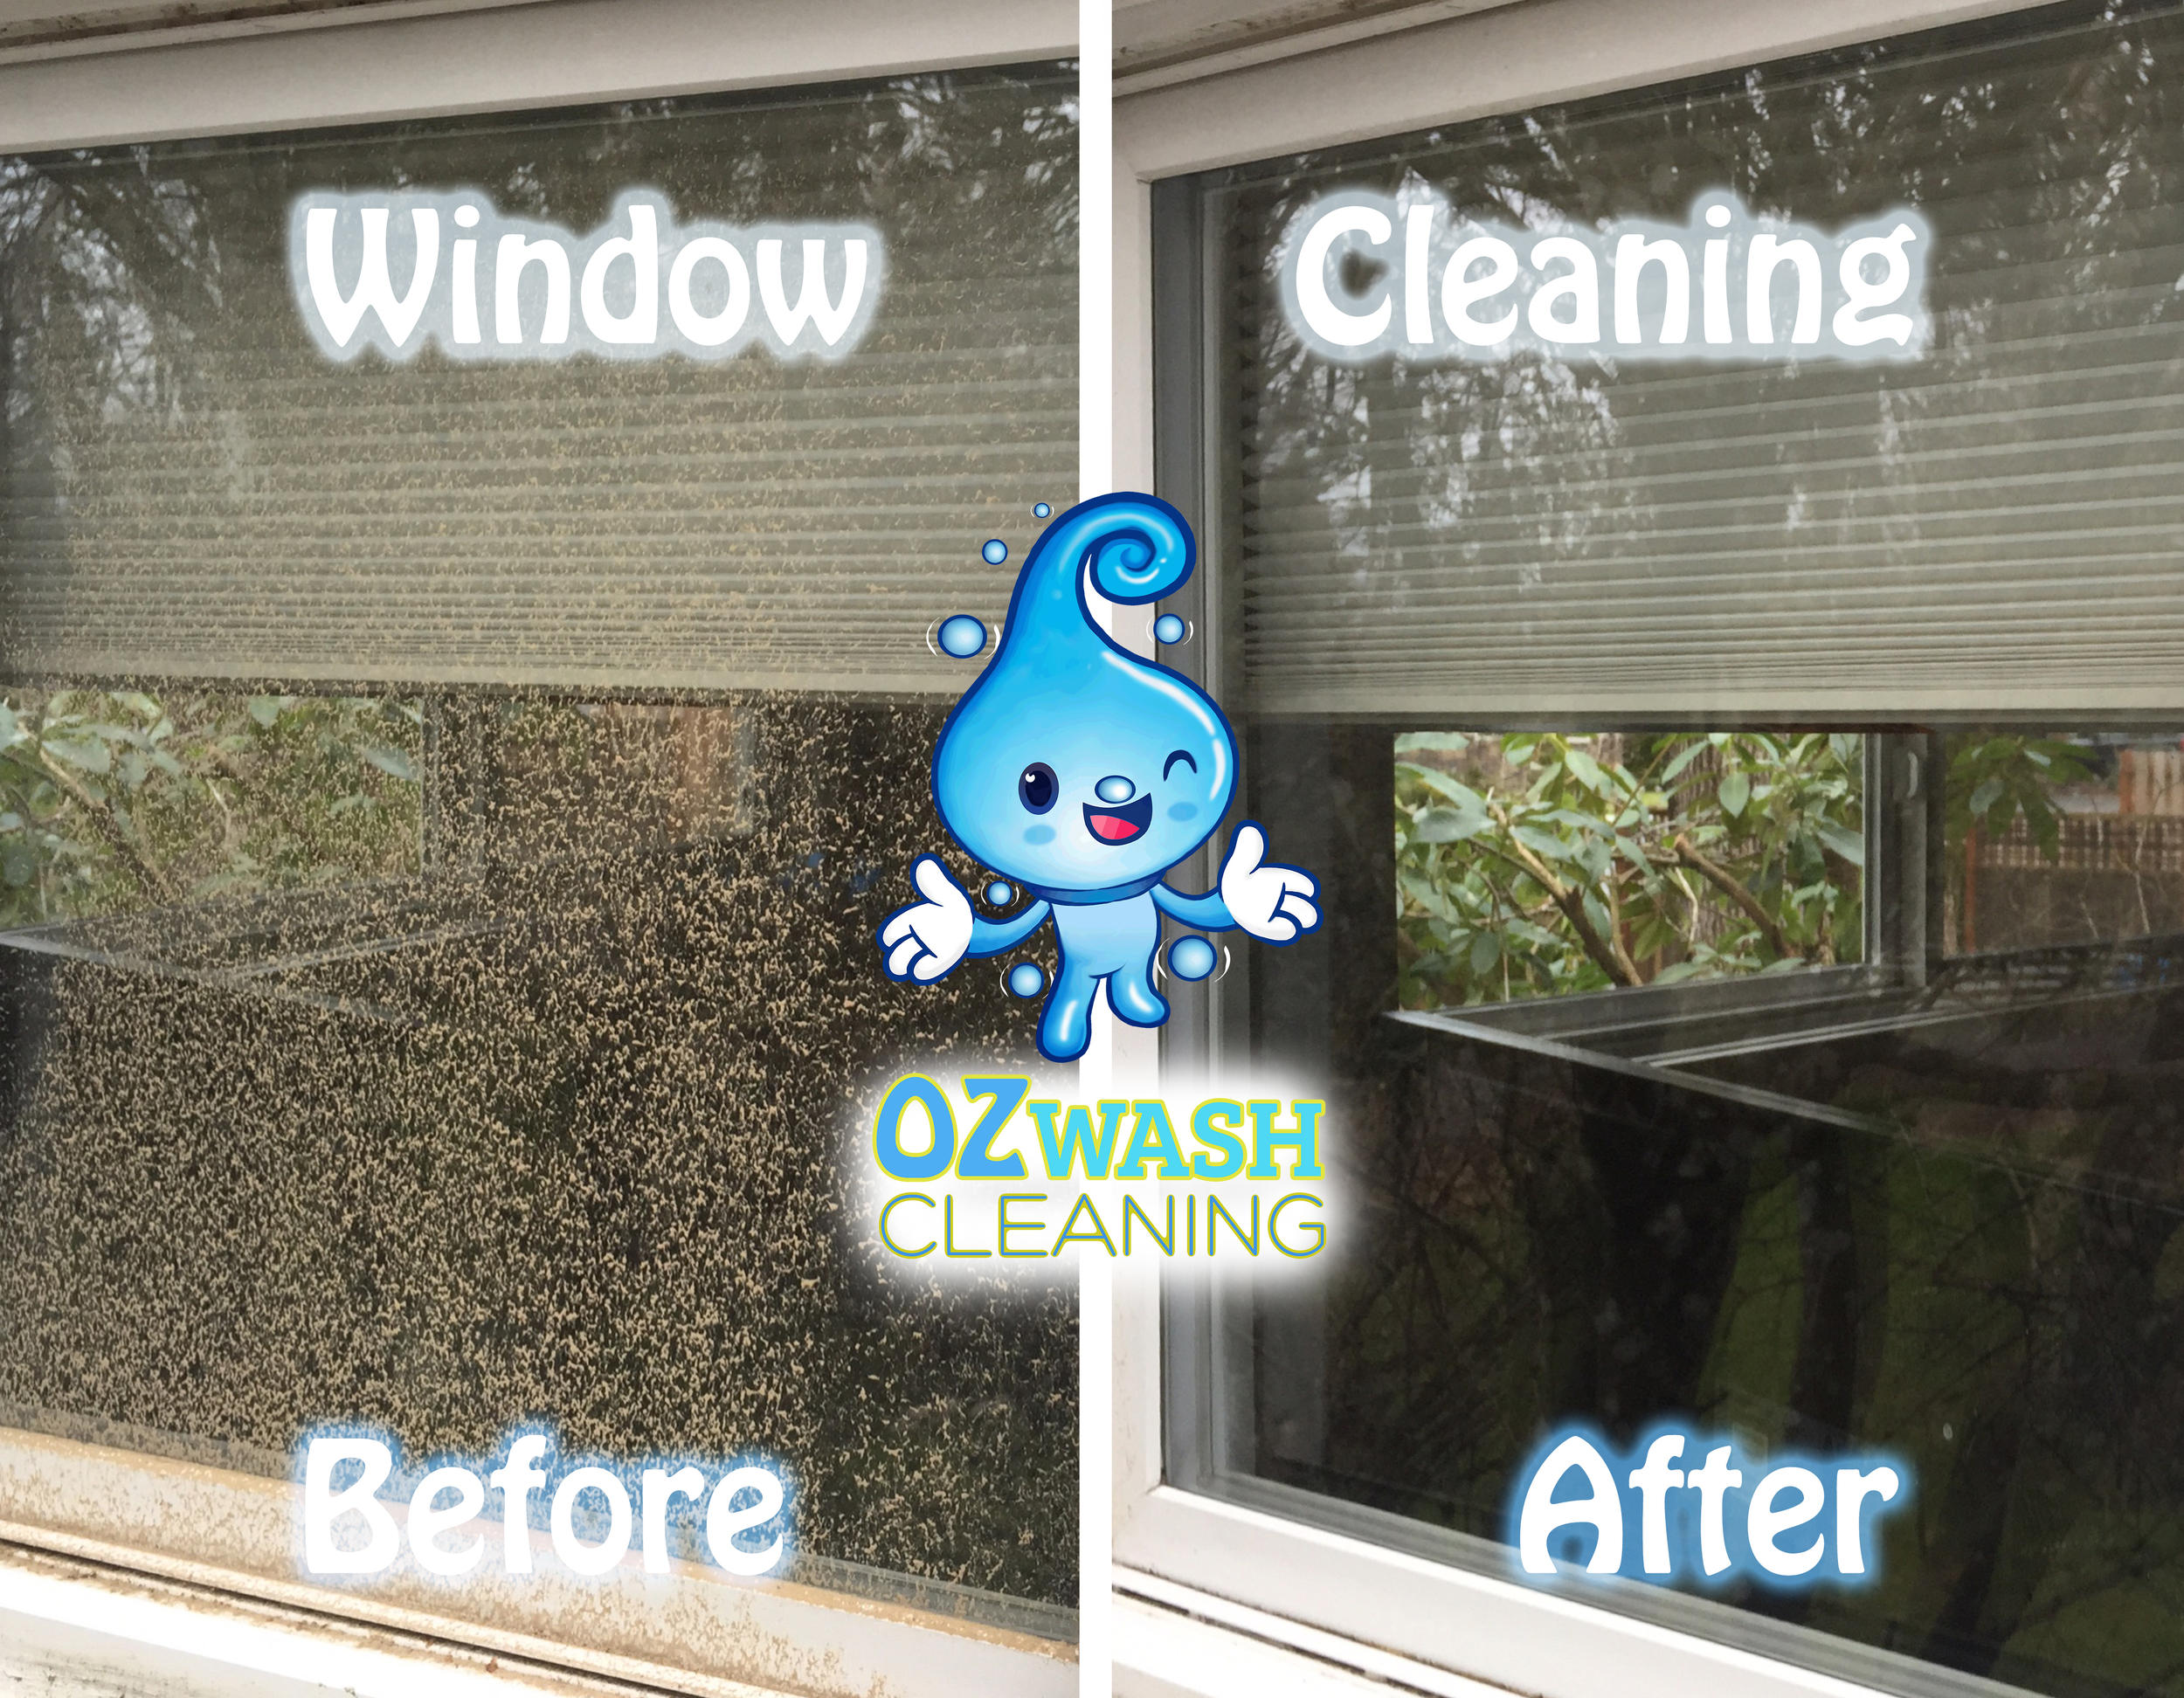 windowcleaning1.jpg